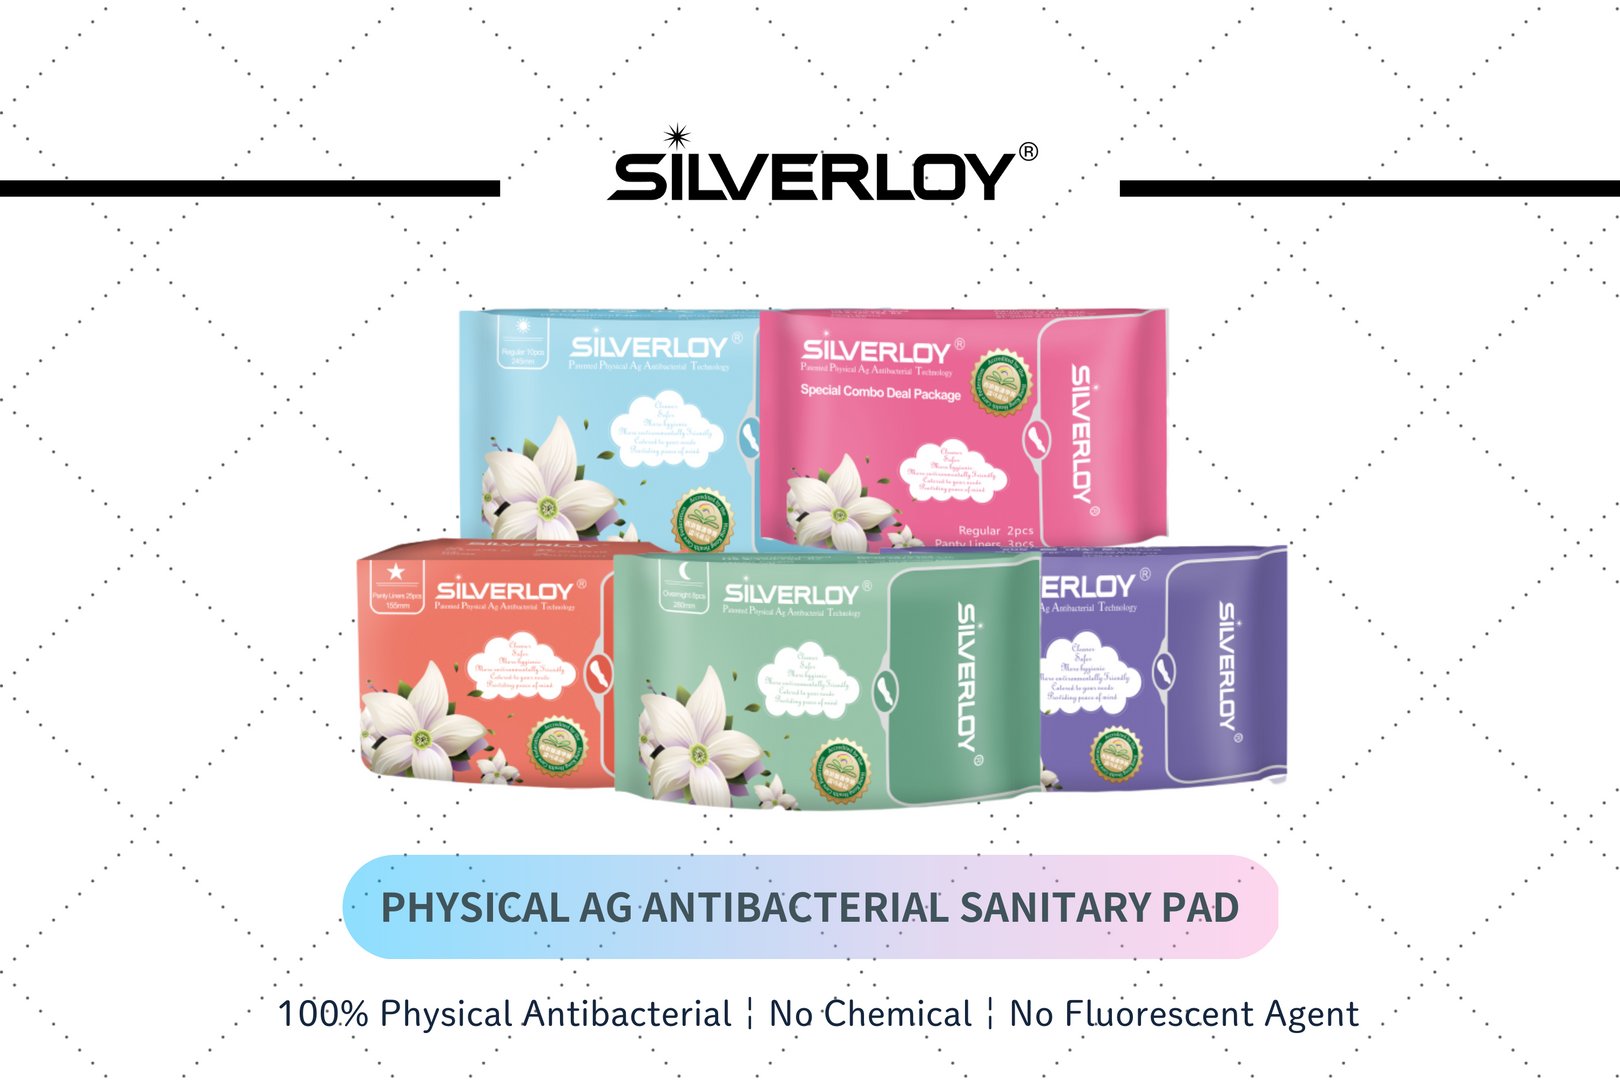 Silverloy Sanitary Pads